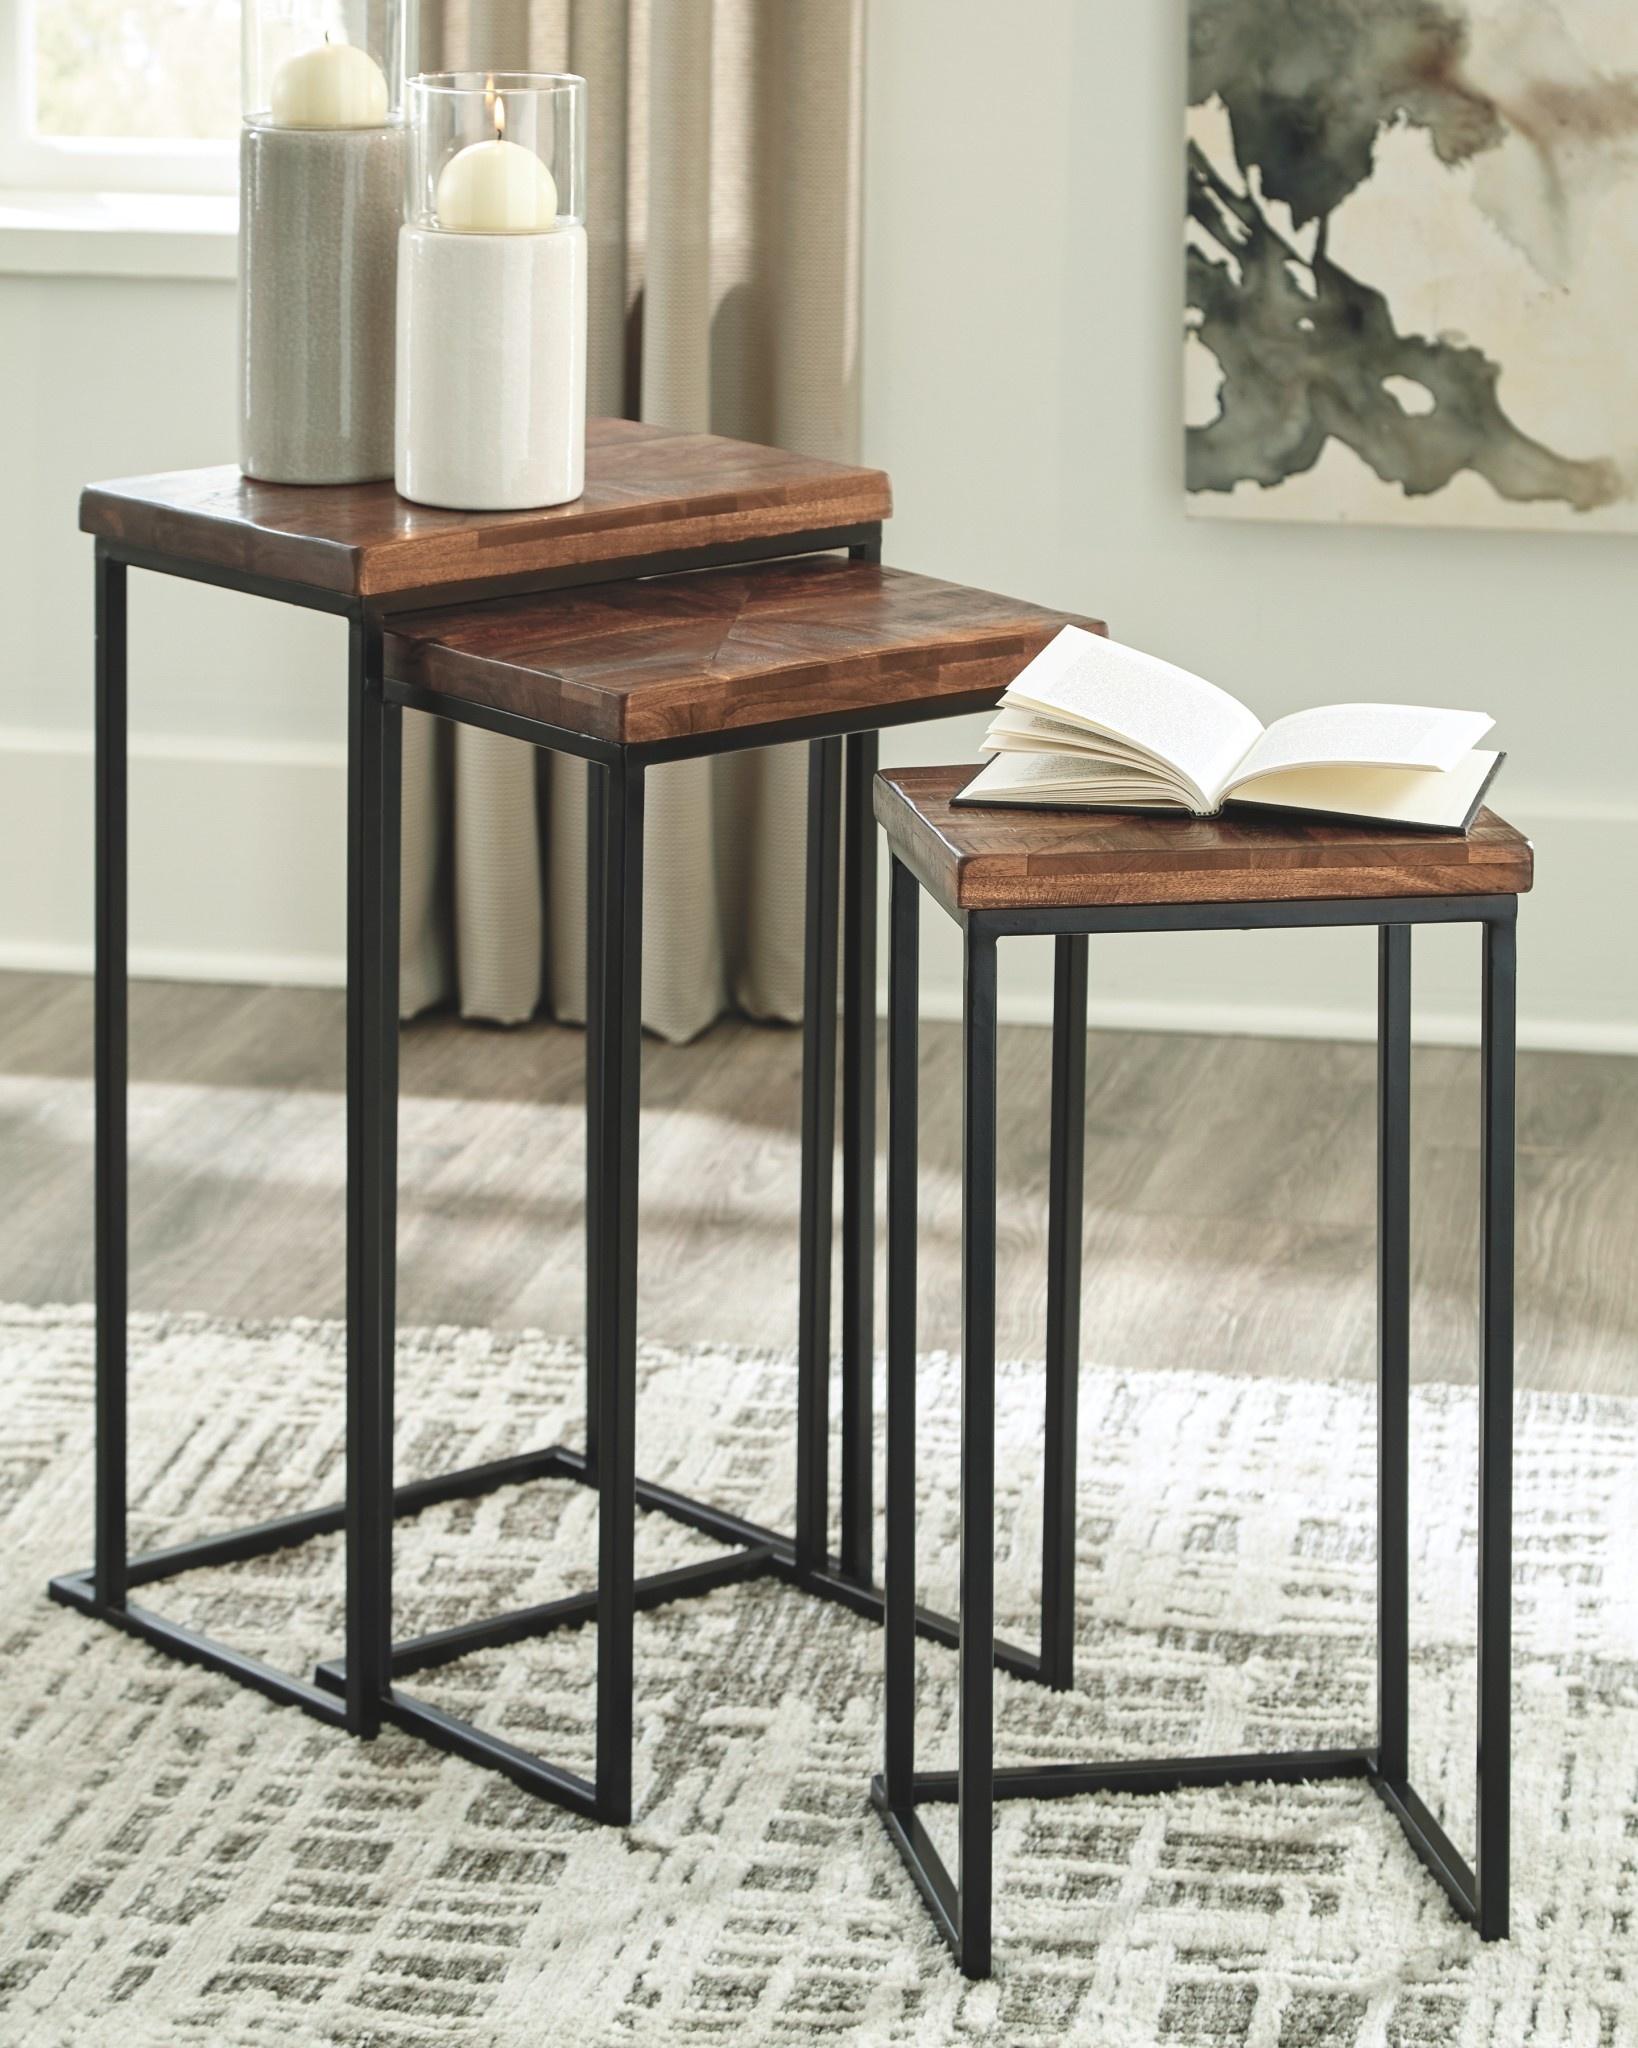 Signature Design Nesting Accent Tables Set of 3- Cainthorne- Brown/Black- A4000256